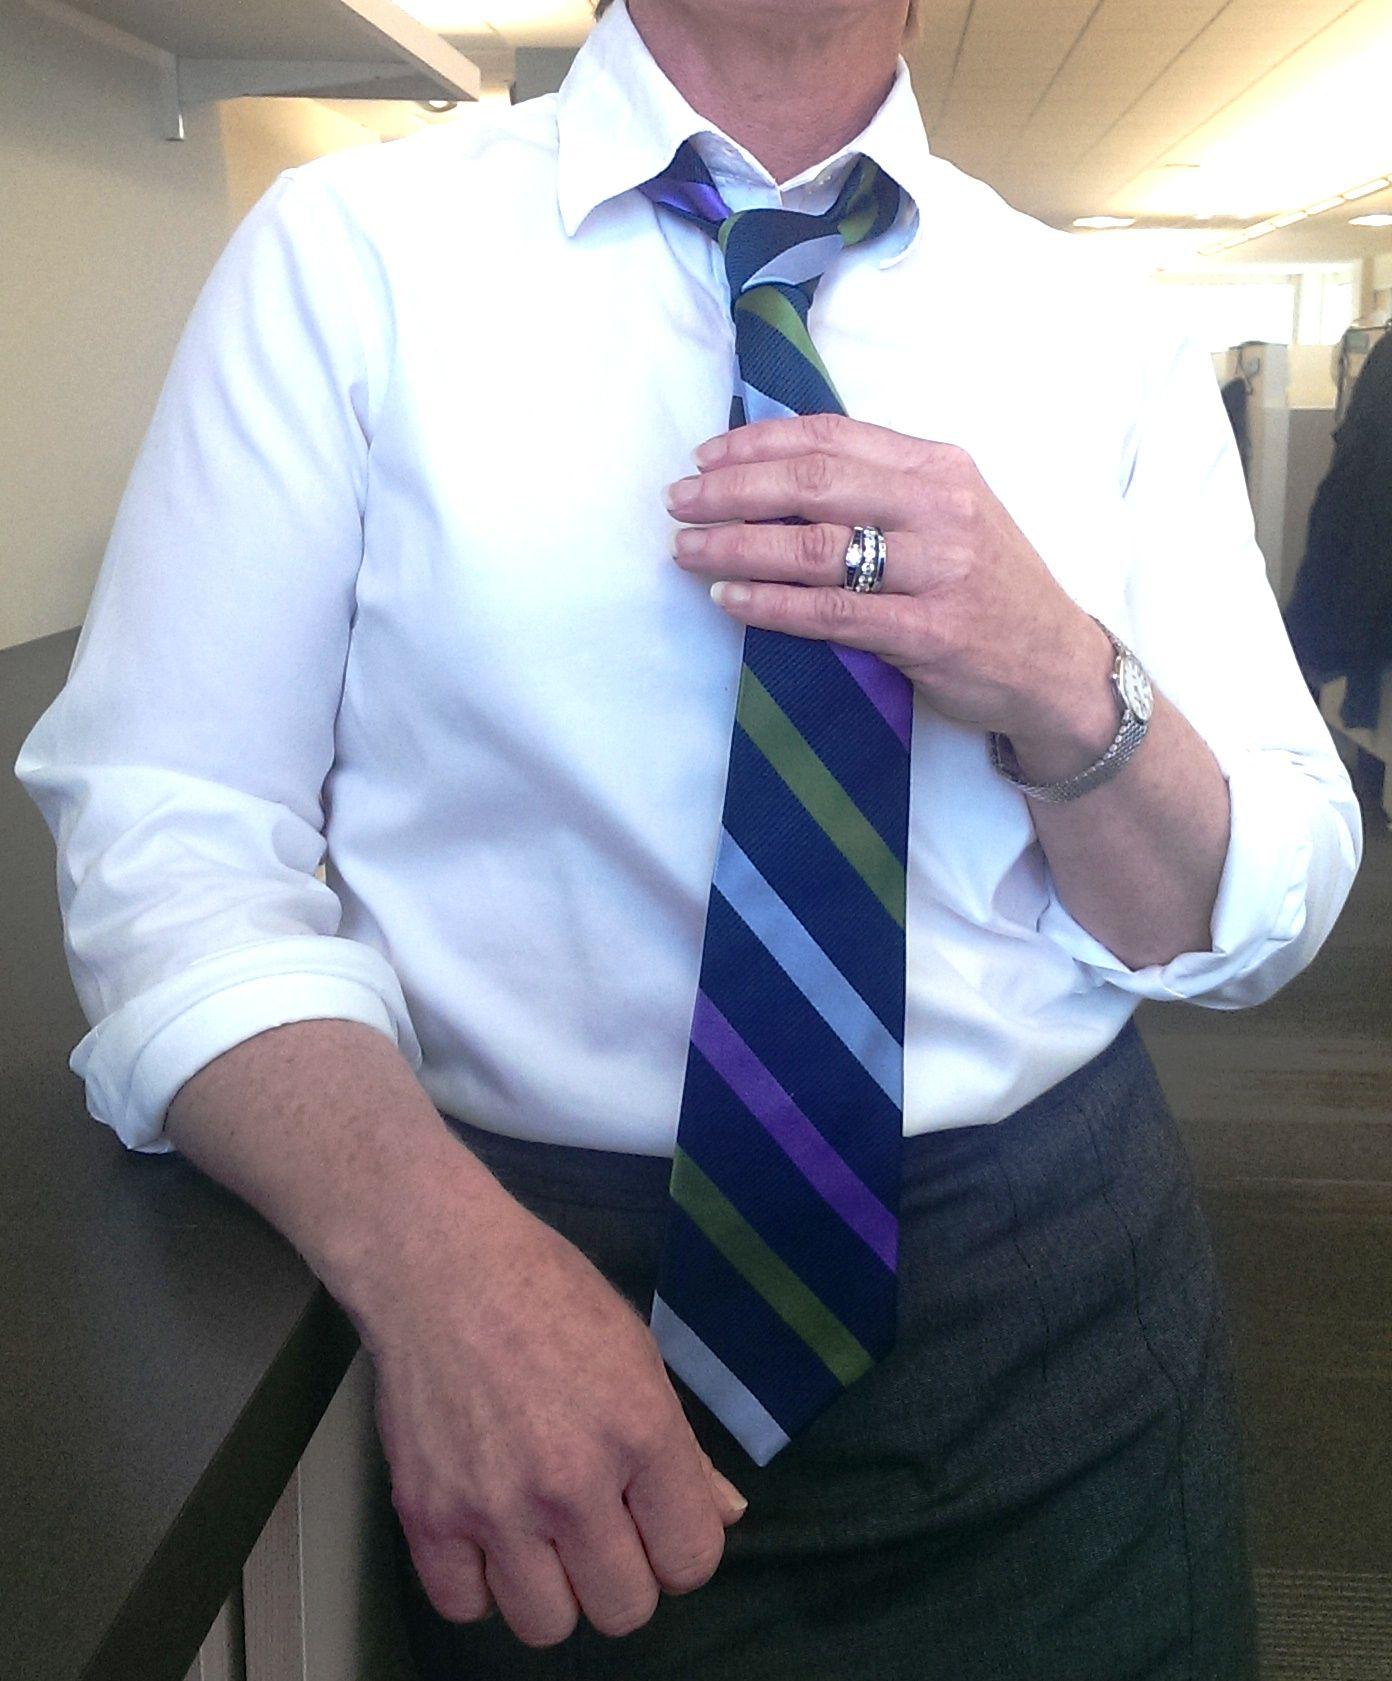 Kirstie decides to go stripes on top of a white/gray combo. Love the jewelry as a bonus. #tuesdaytieday #winterwyman